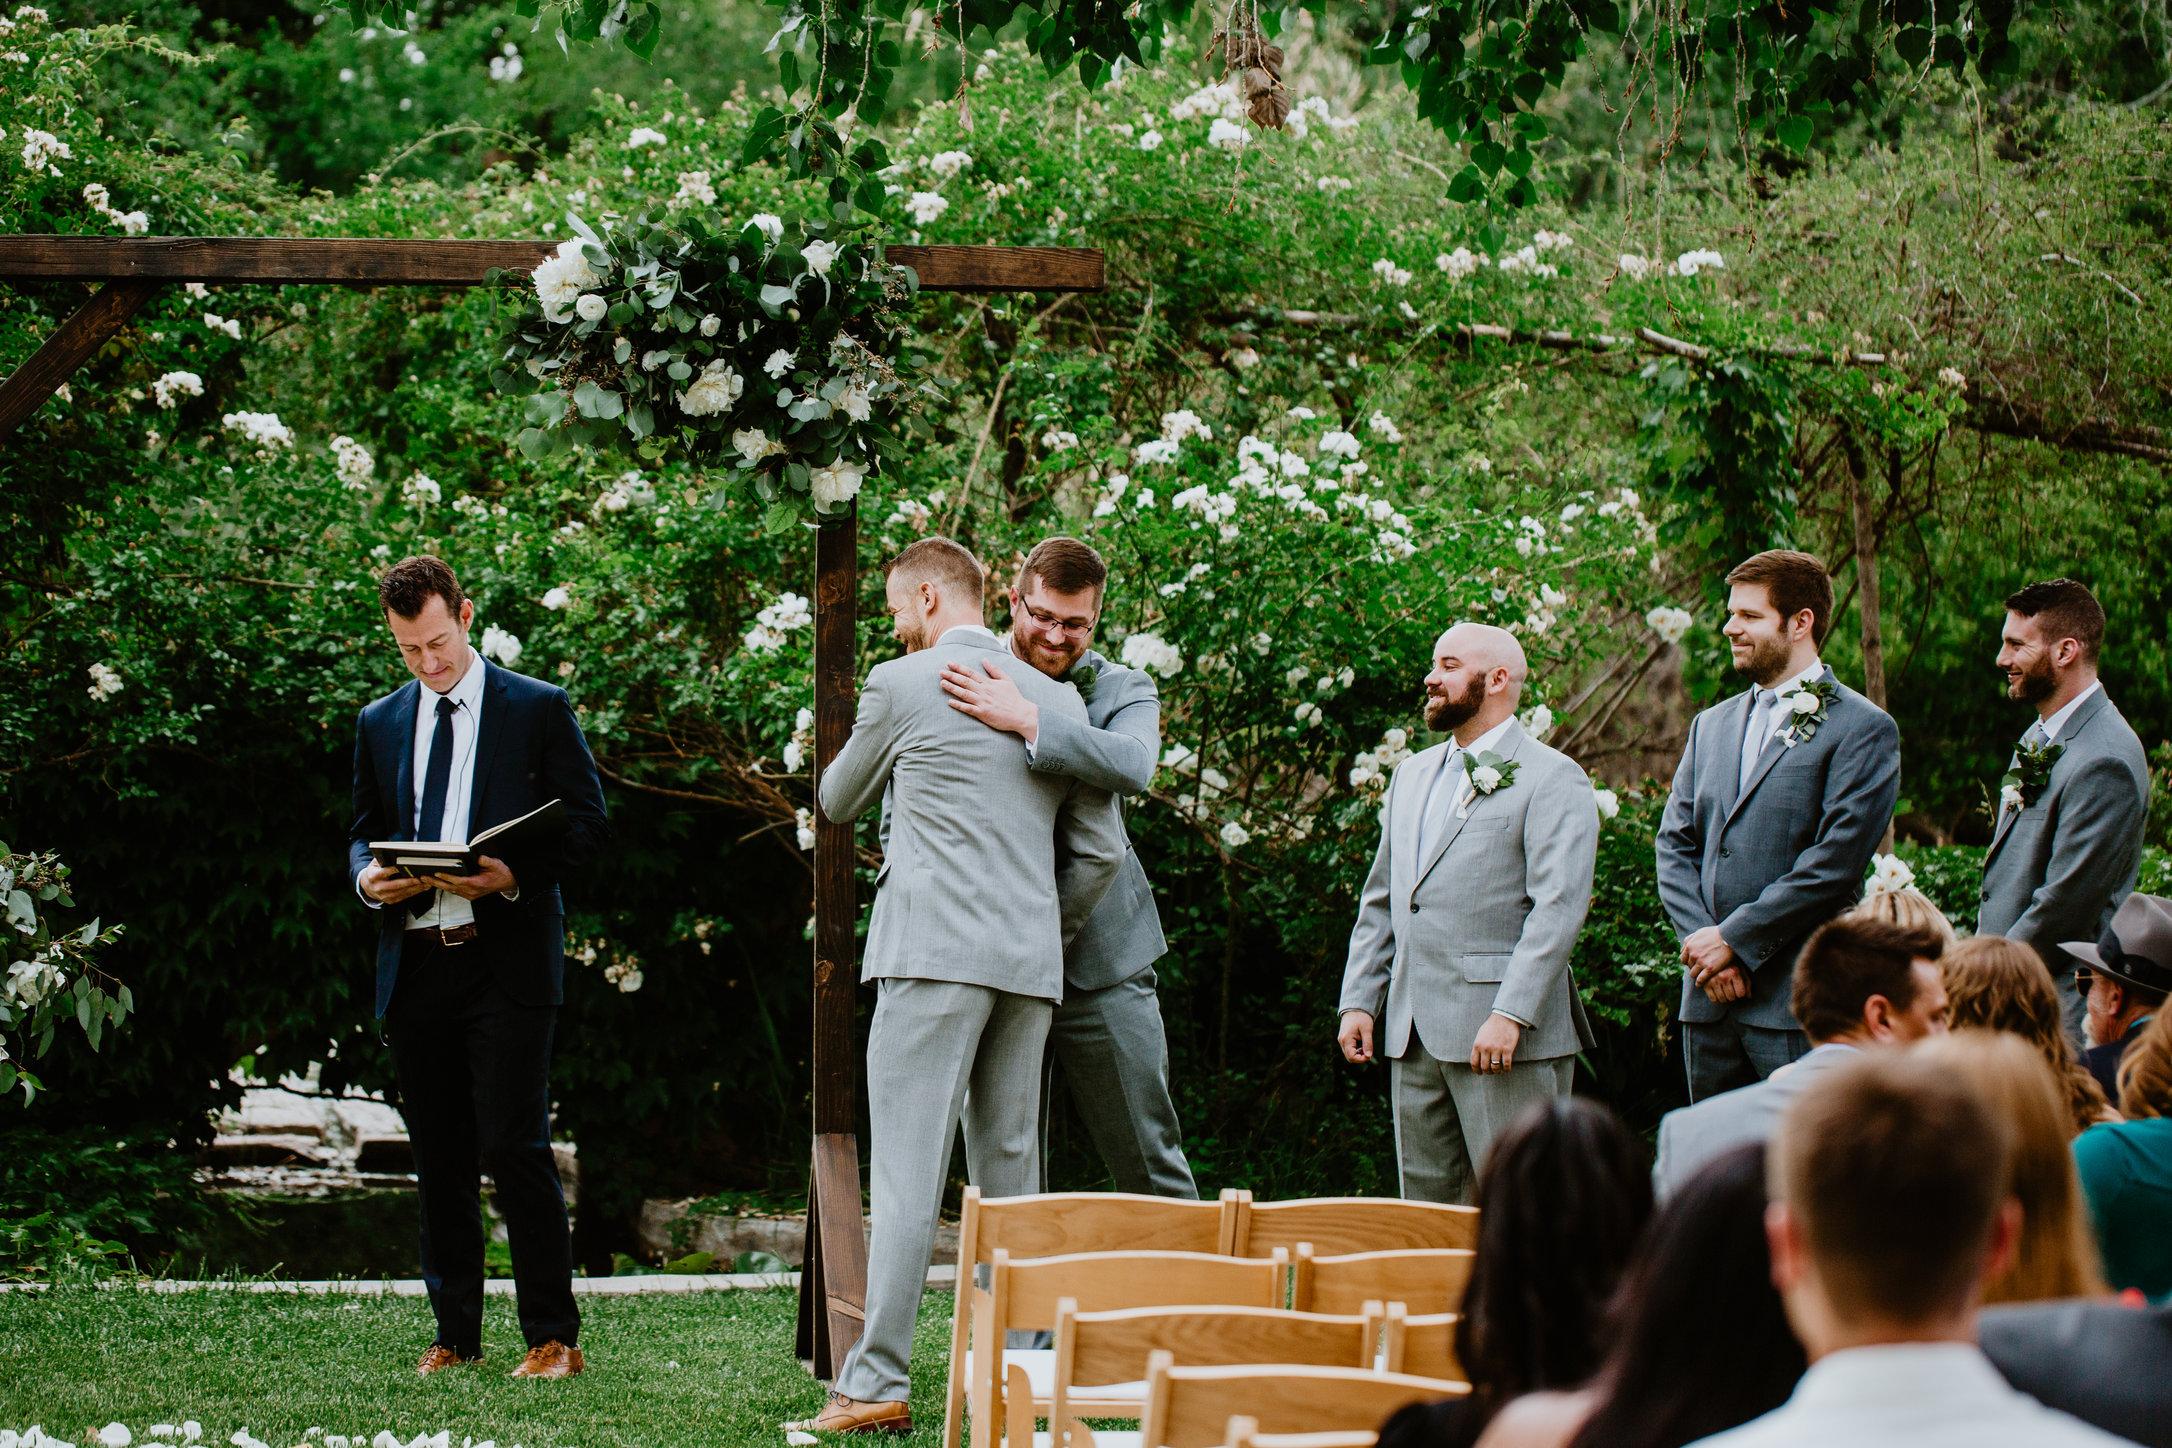 DandA-wedding-198.jpg